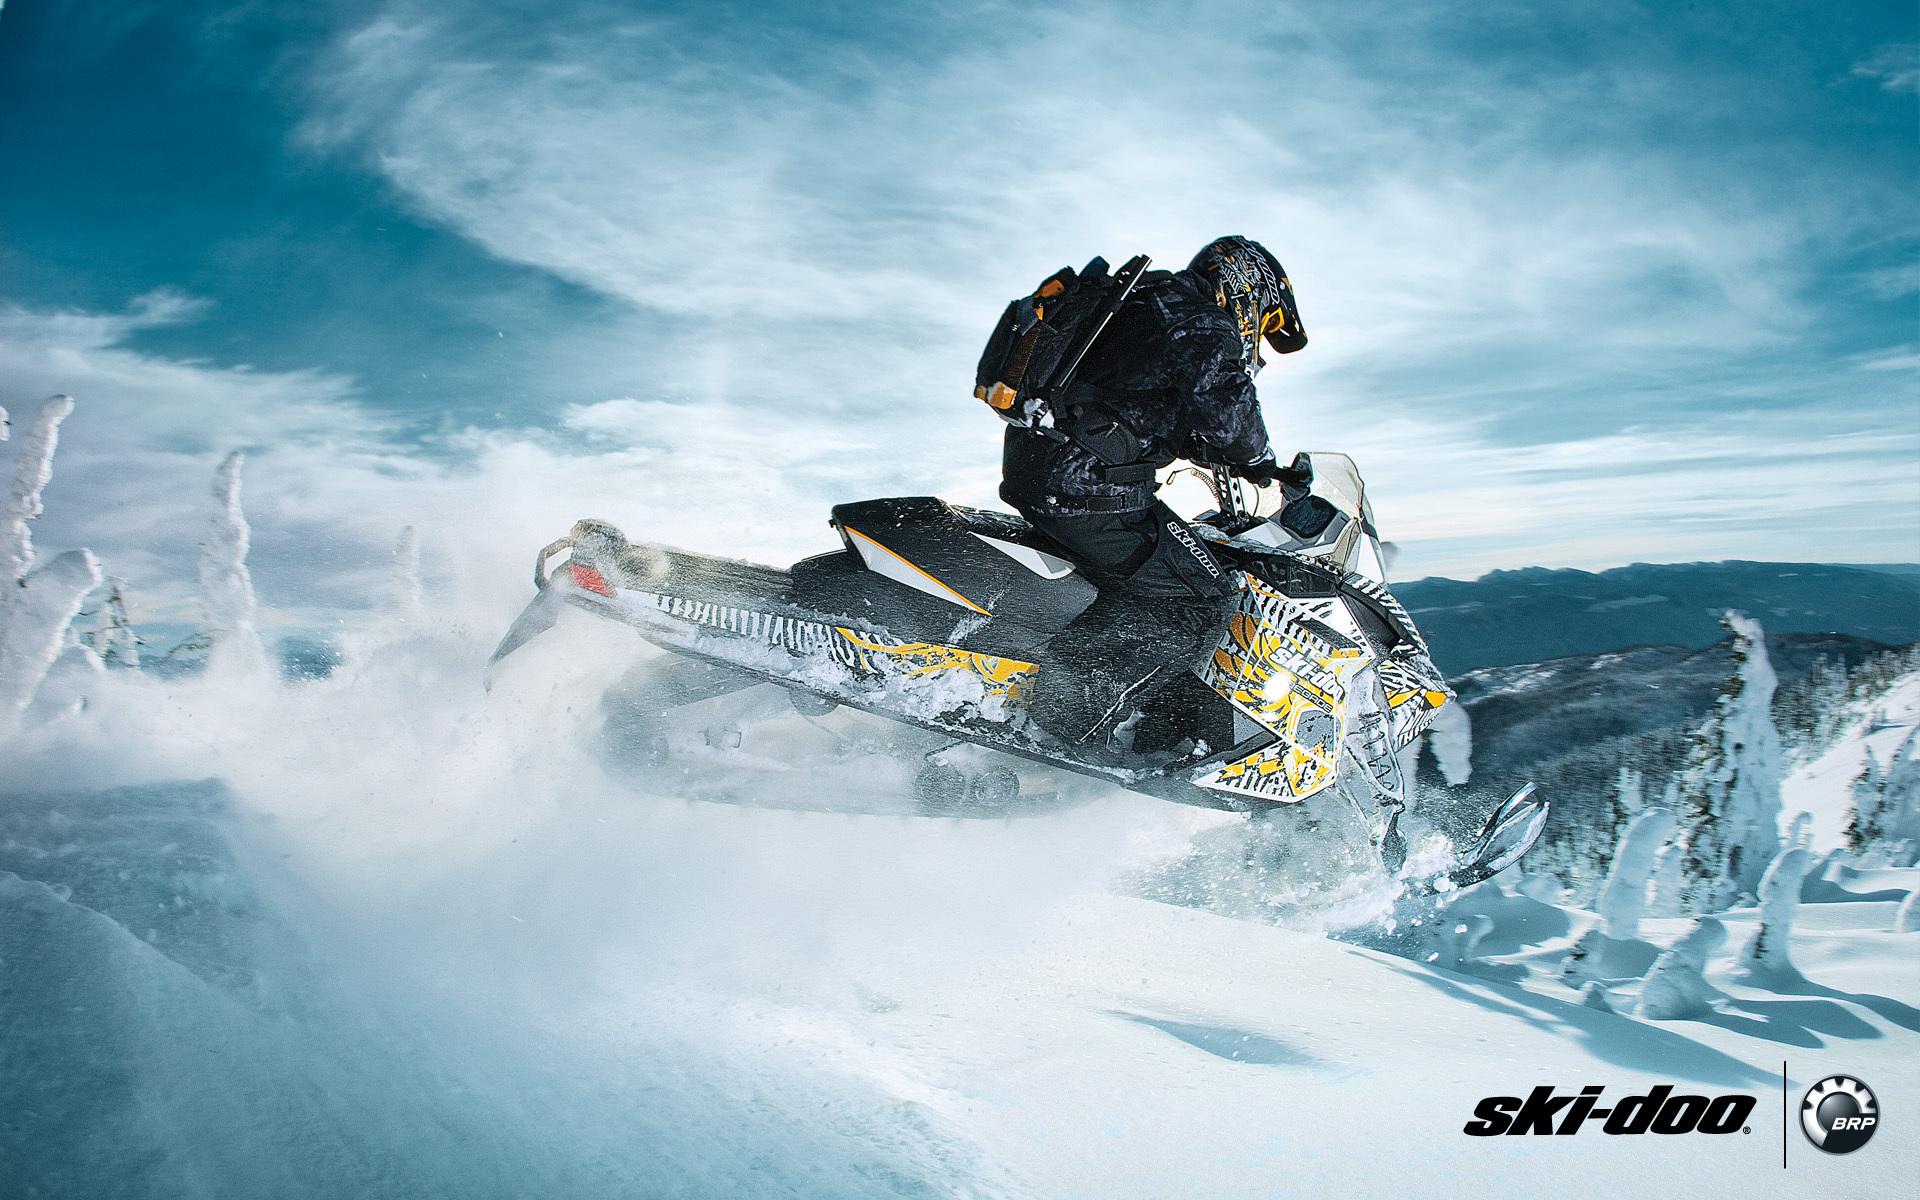 Ski doo ski doo renegade backcountry x 600 snowmobile snowmobile 1680x1050